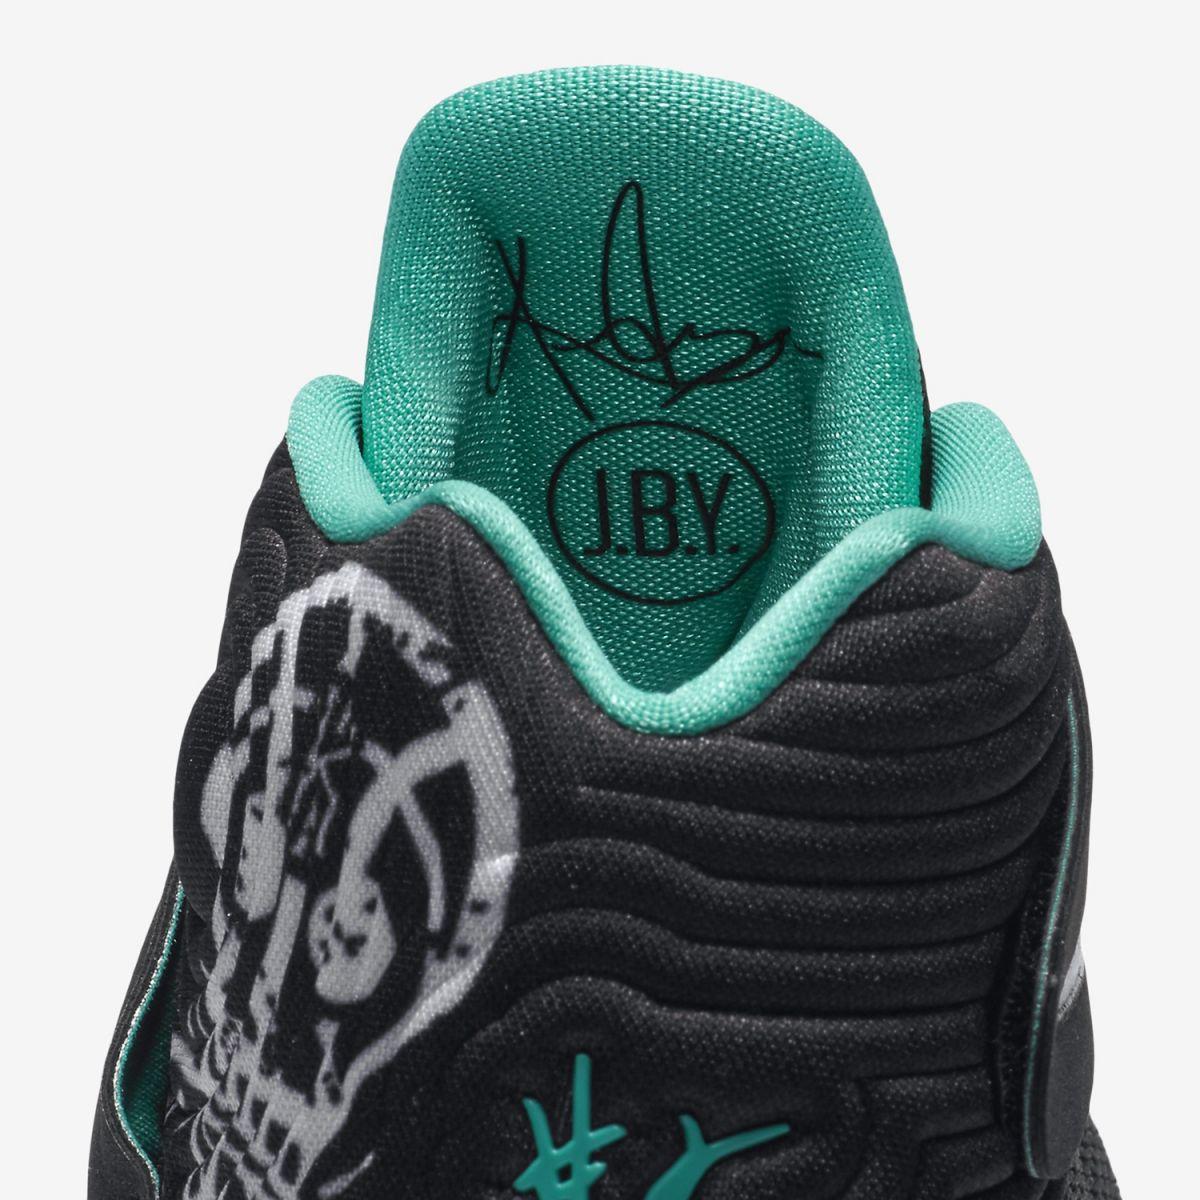 bd10fa557f0e Nike Made Kyrie Irving Shoes for Skateboarders